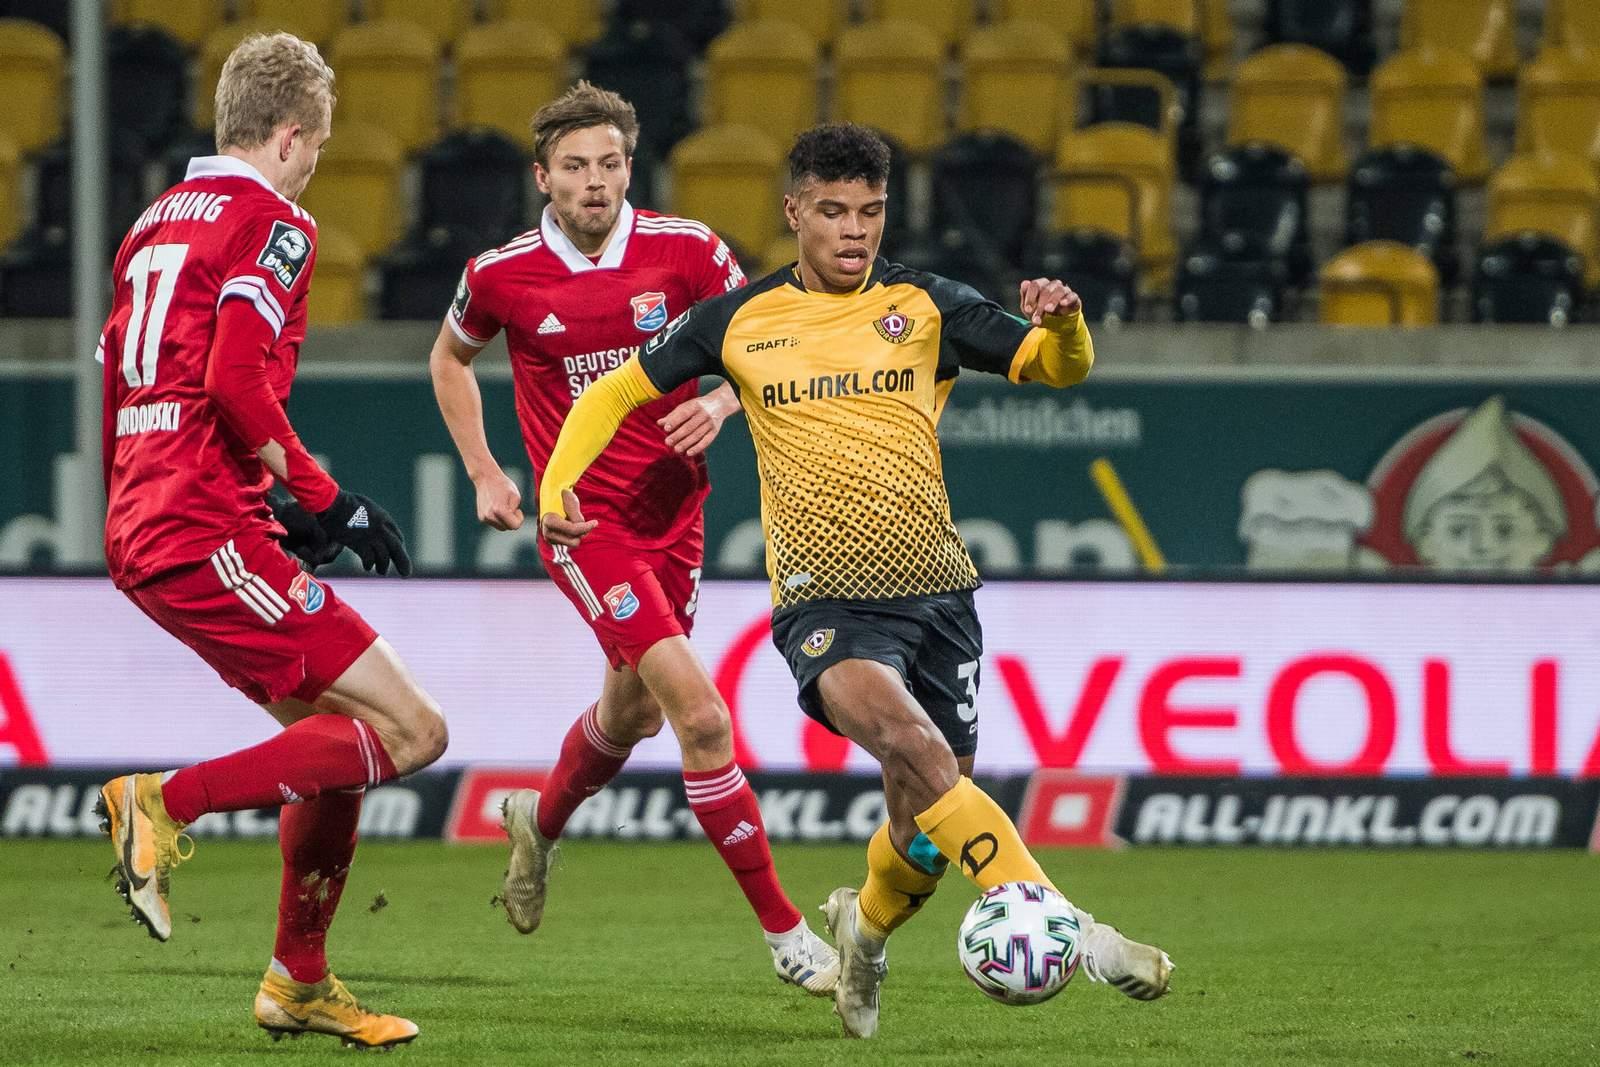 Ransford Königsdörffer von Dynamo Dresden